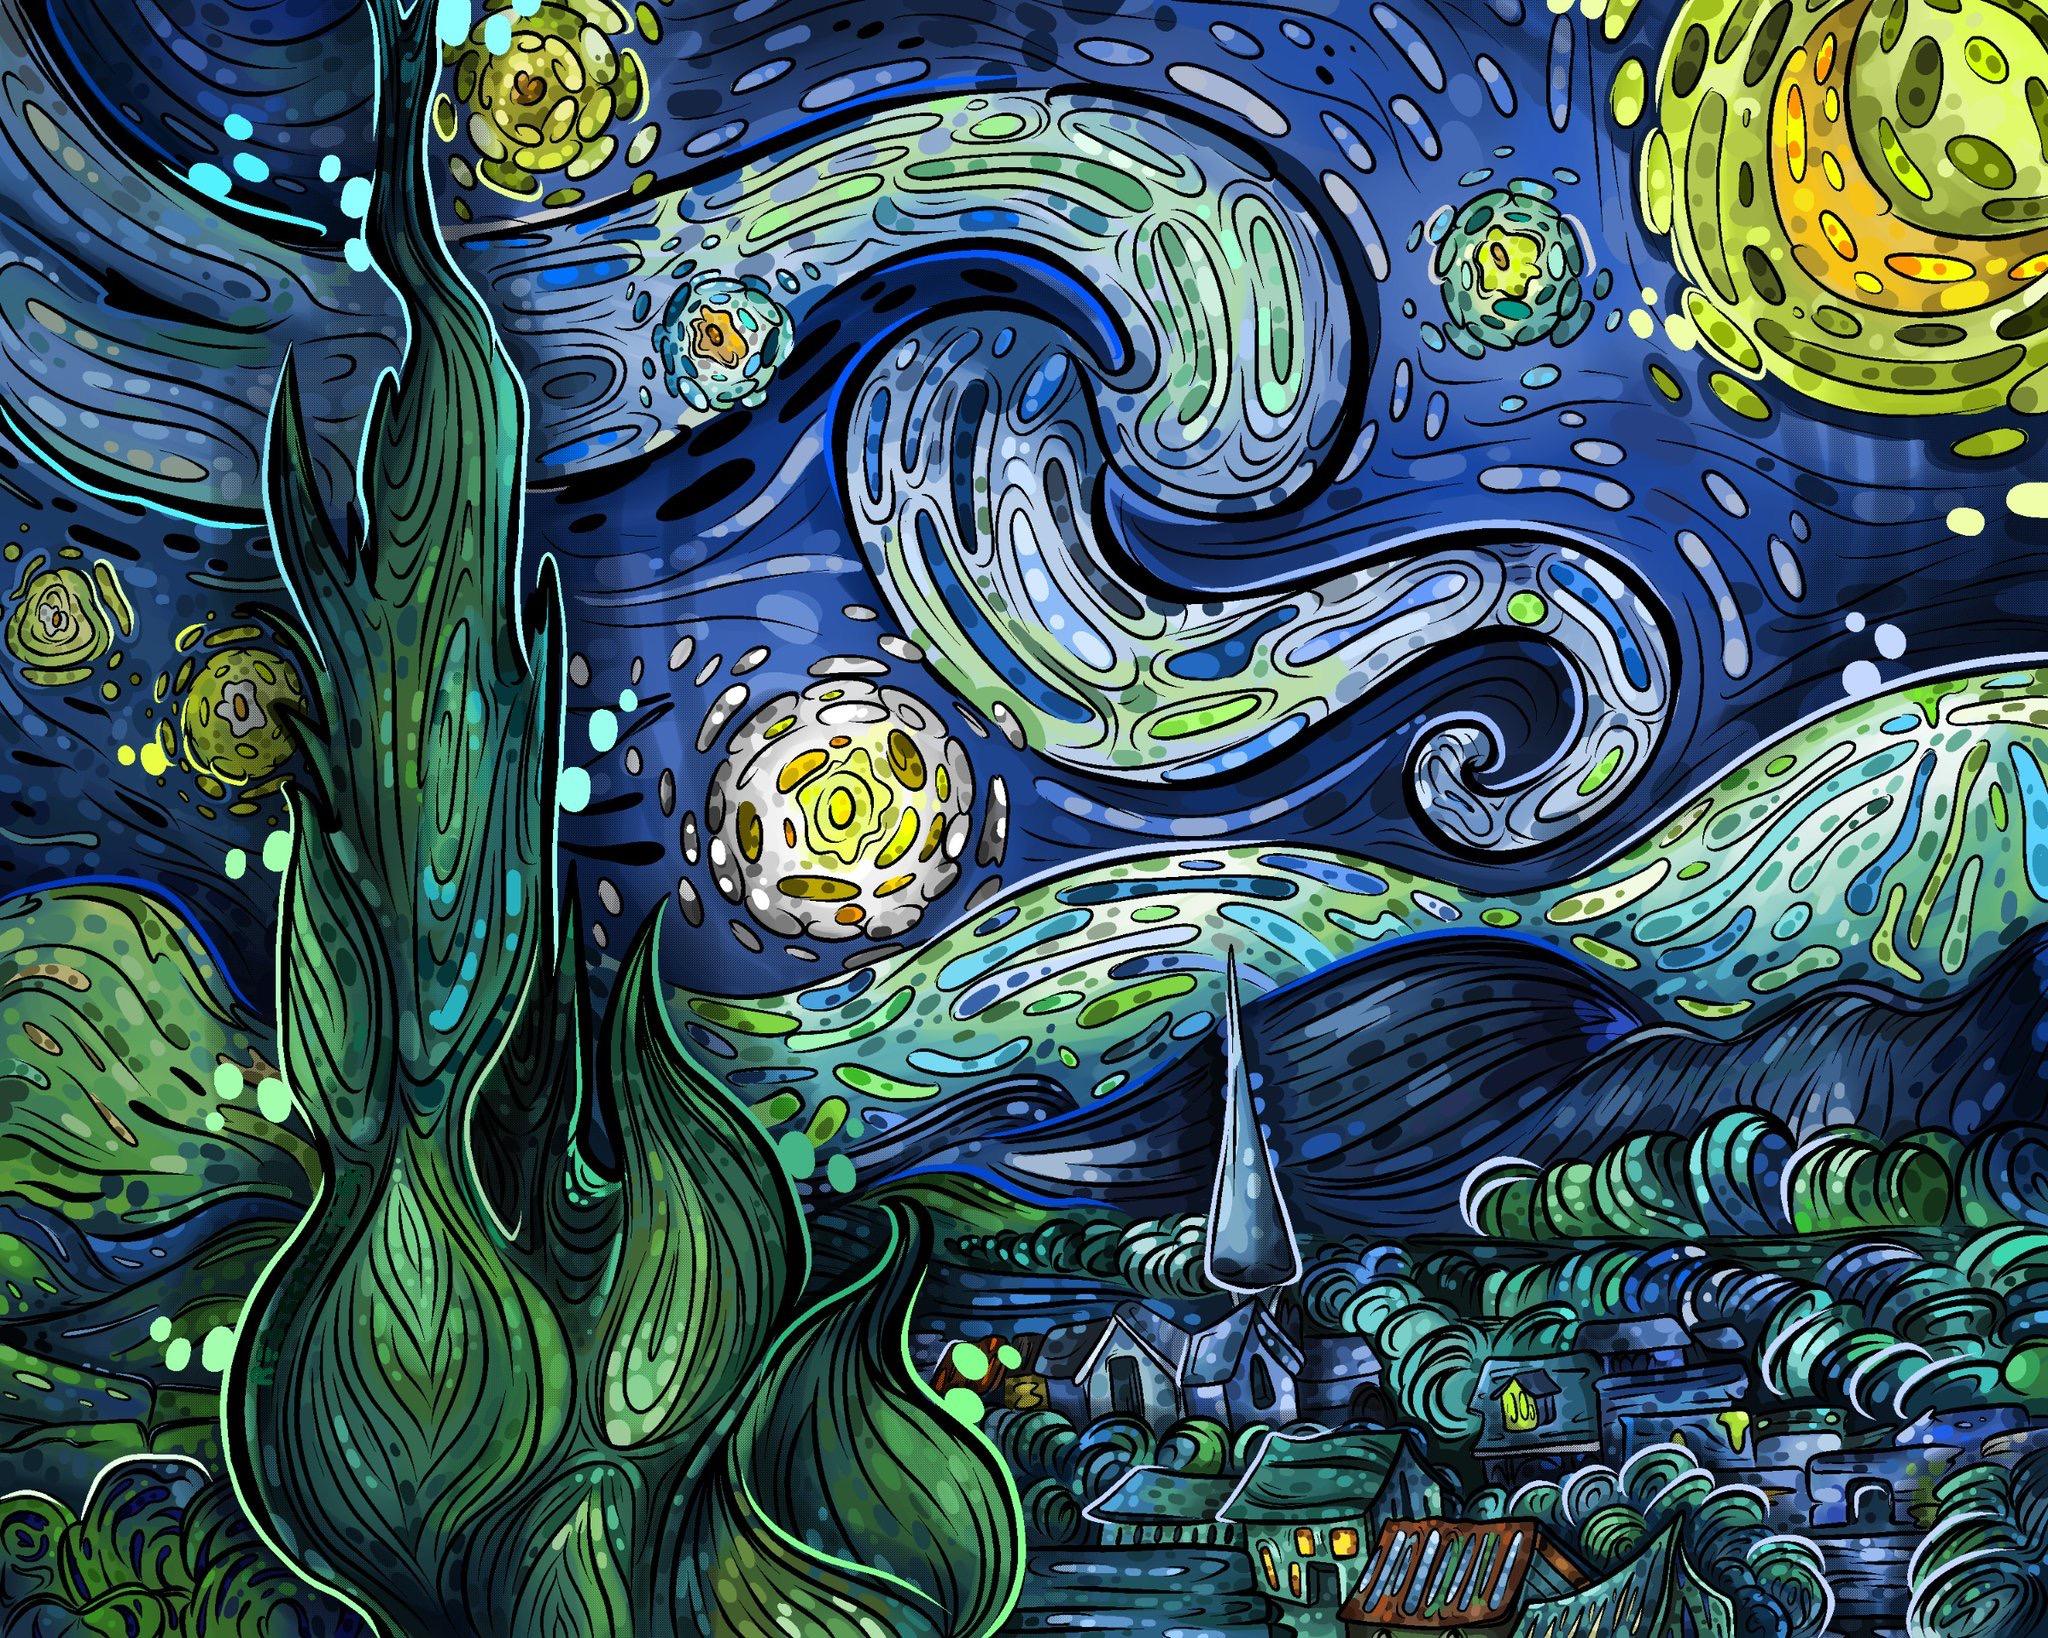 Starry Night Study